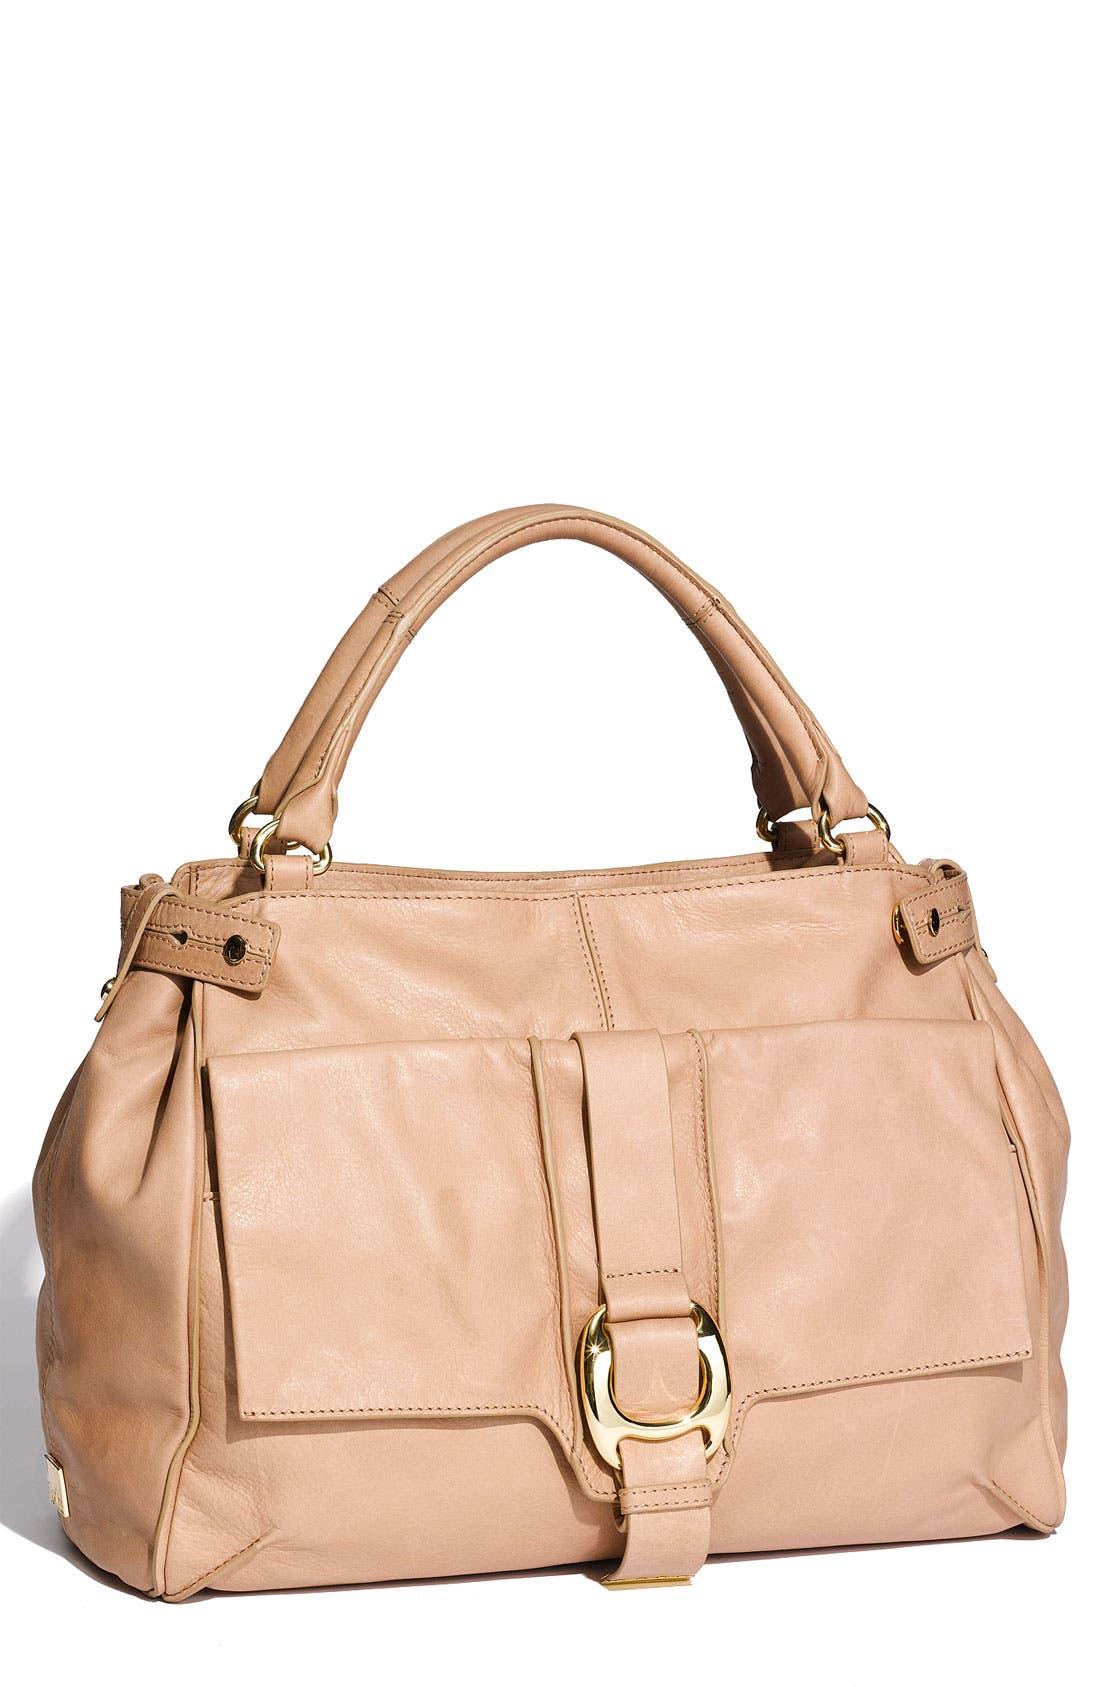 Main Image - Kooba 'Anya' Leather Satchel